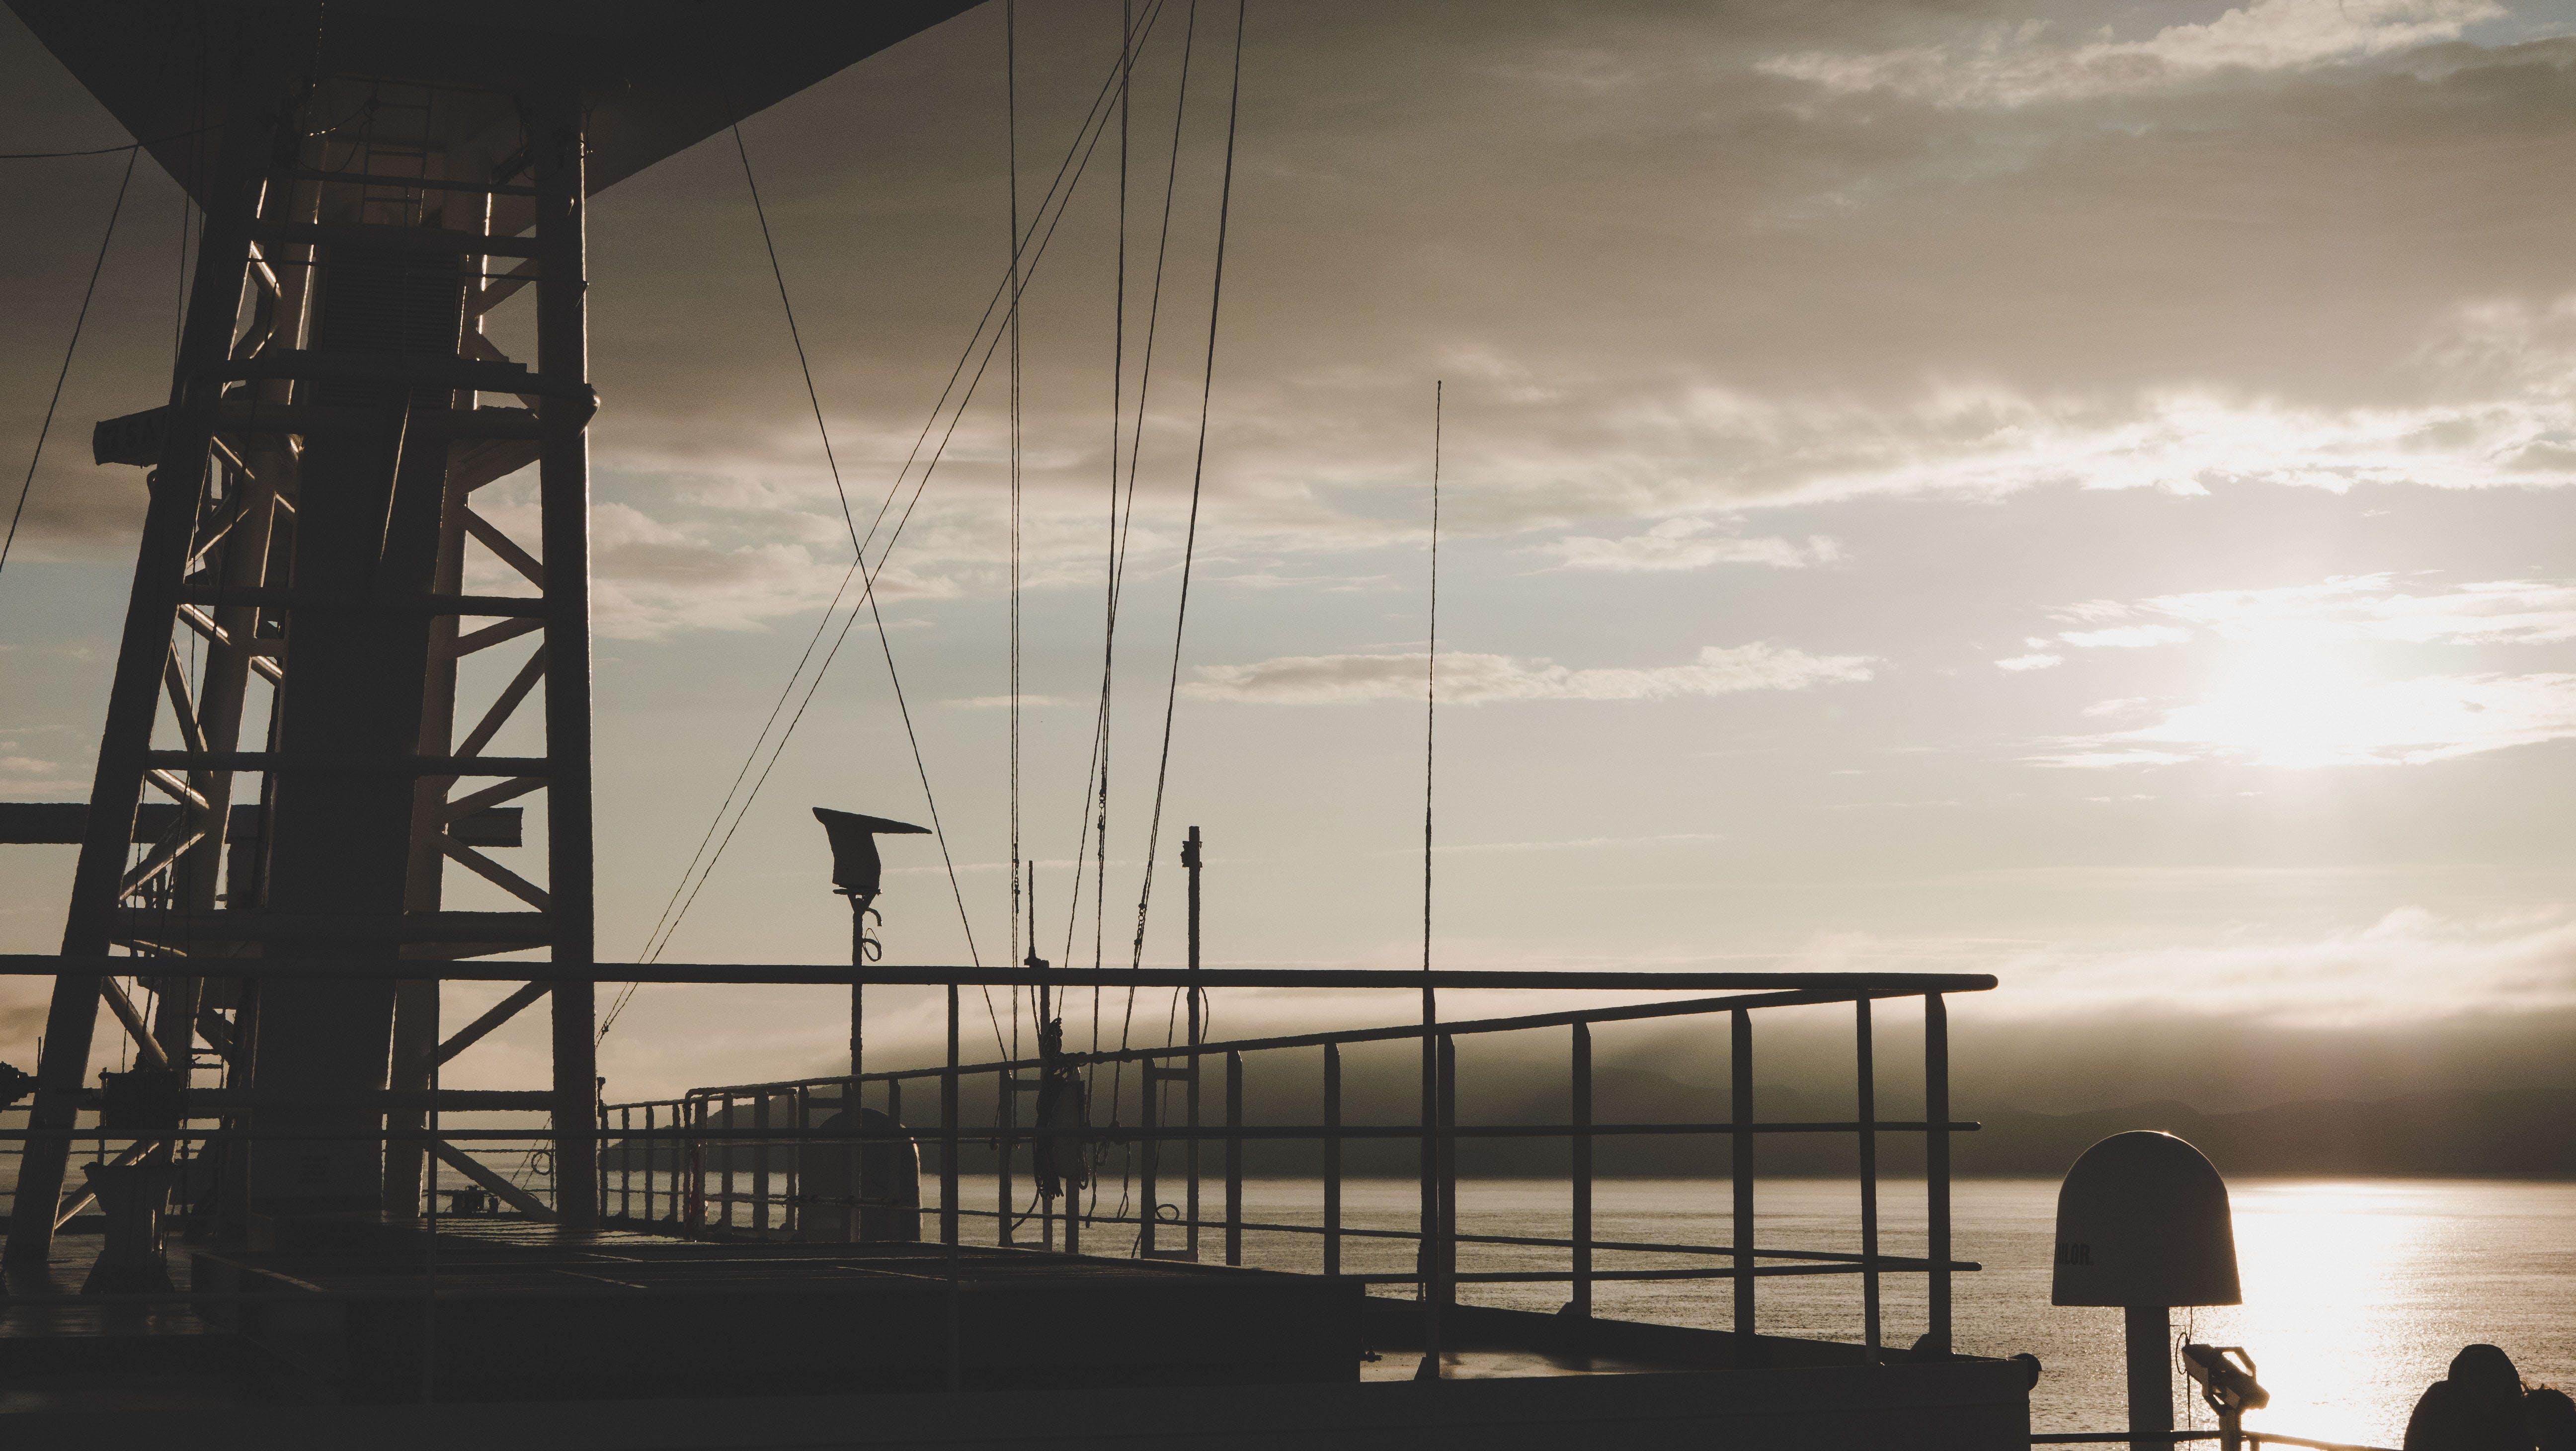 Free stock photo of cargo ship, sailing